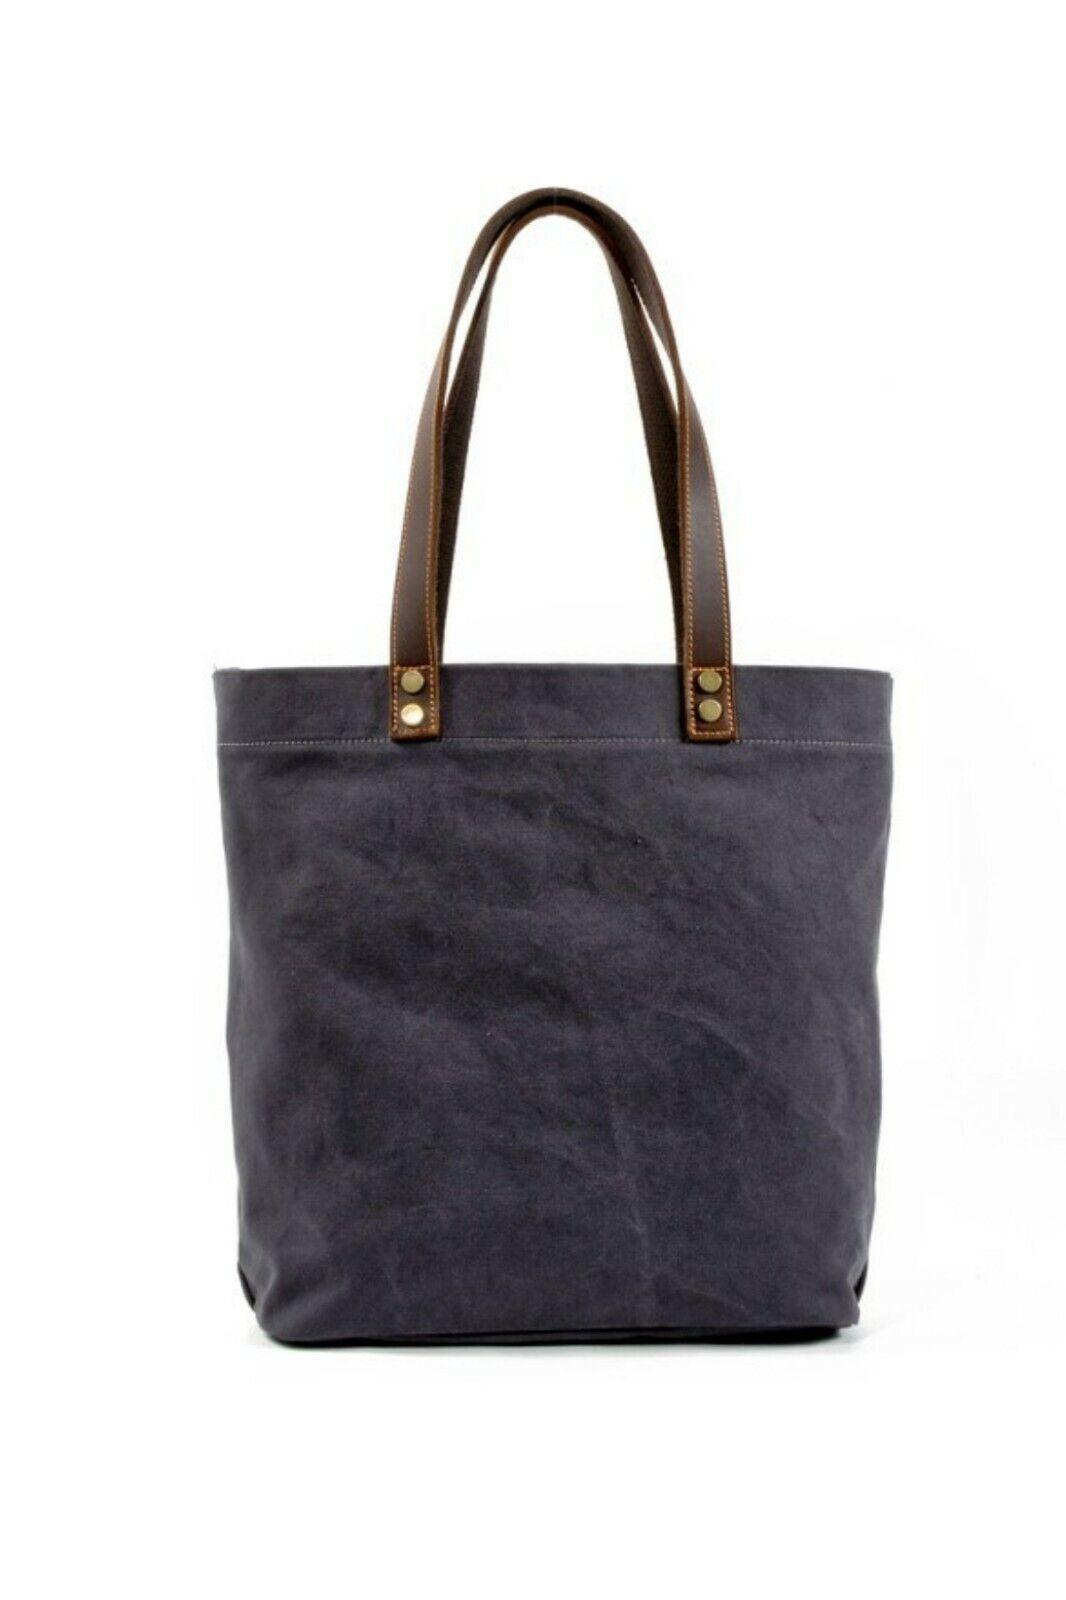 Medium Canvas Tote Bag Shoulder Bag Leather Handle Handbag F